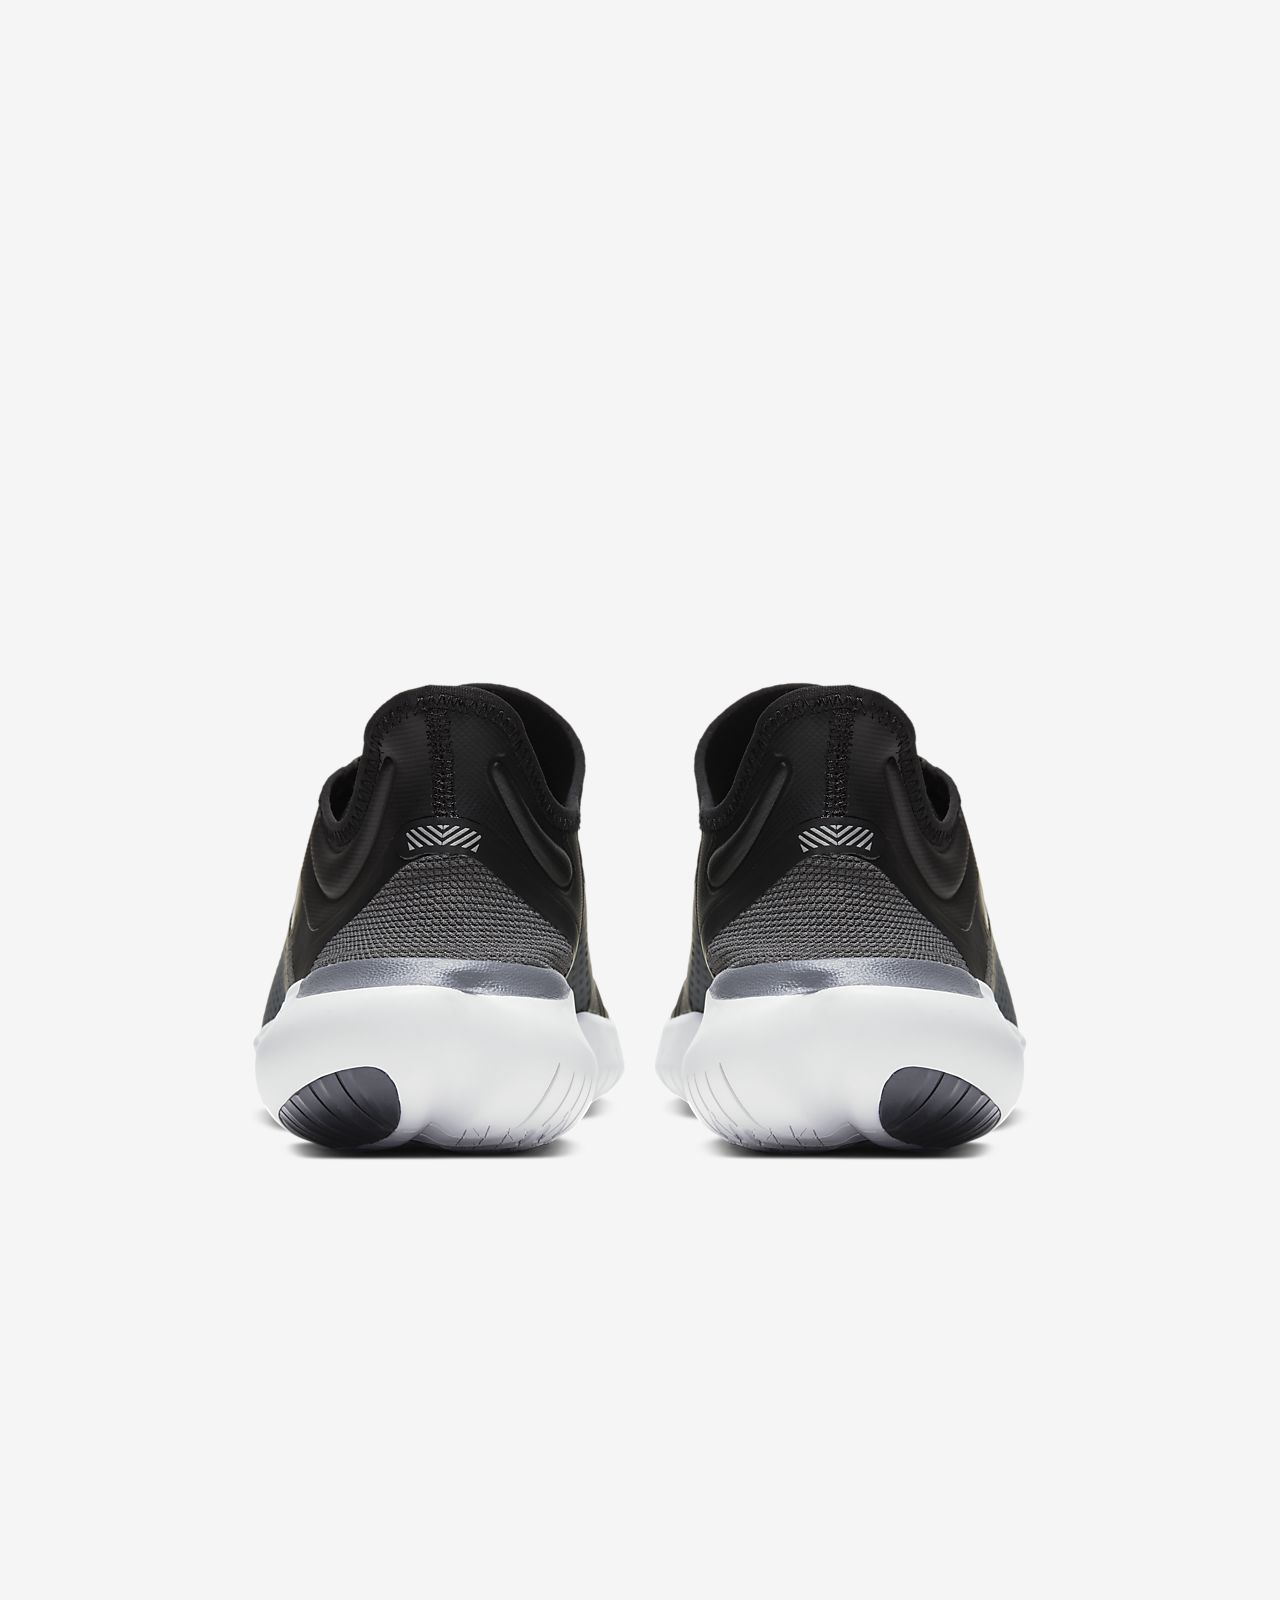 Angemessener Preis Nike Free 5.0 + Schwarz Weiß